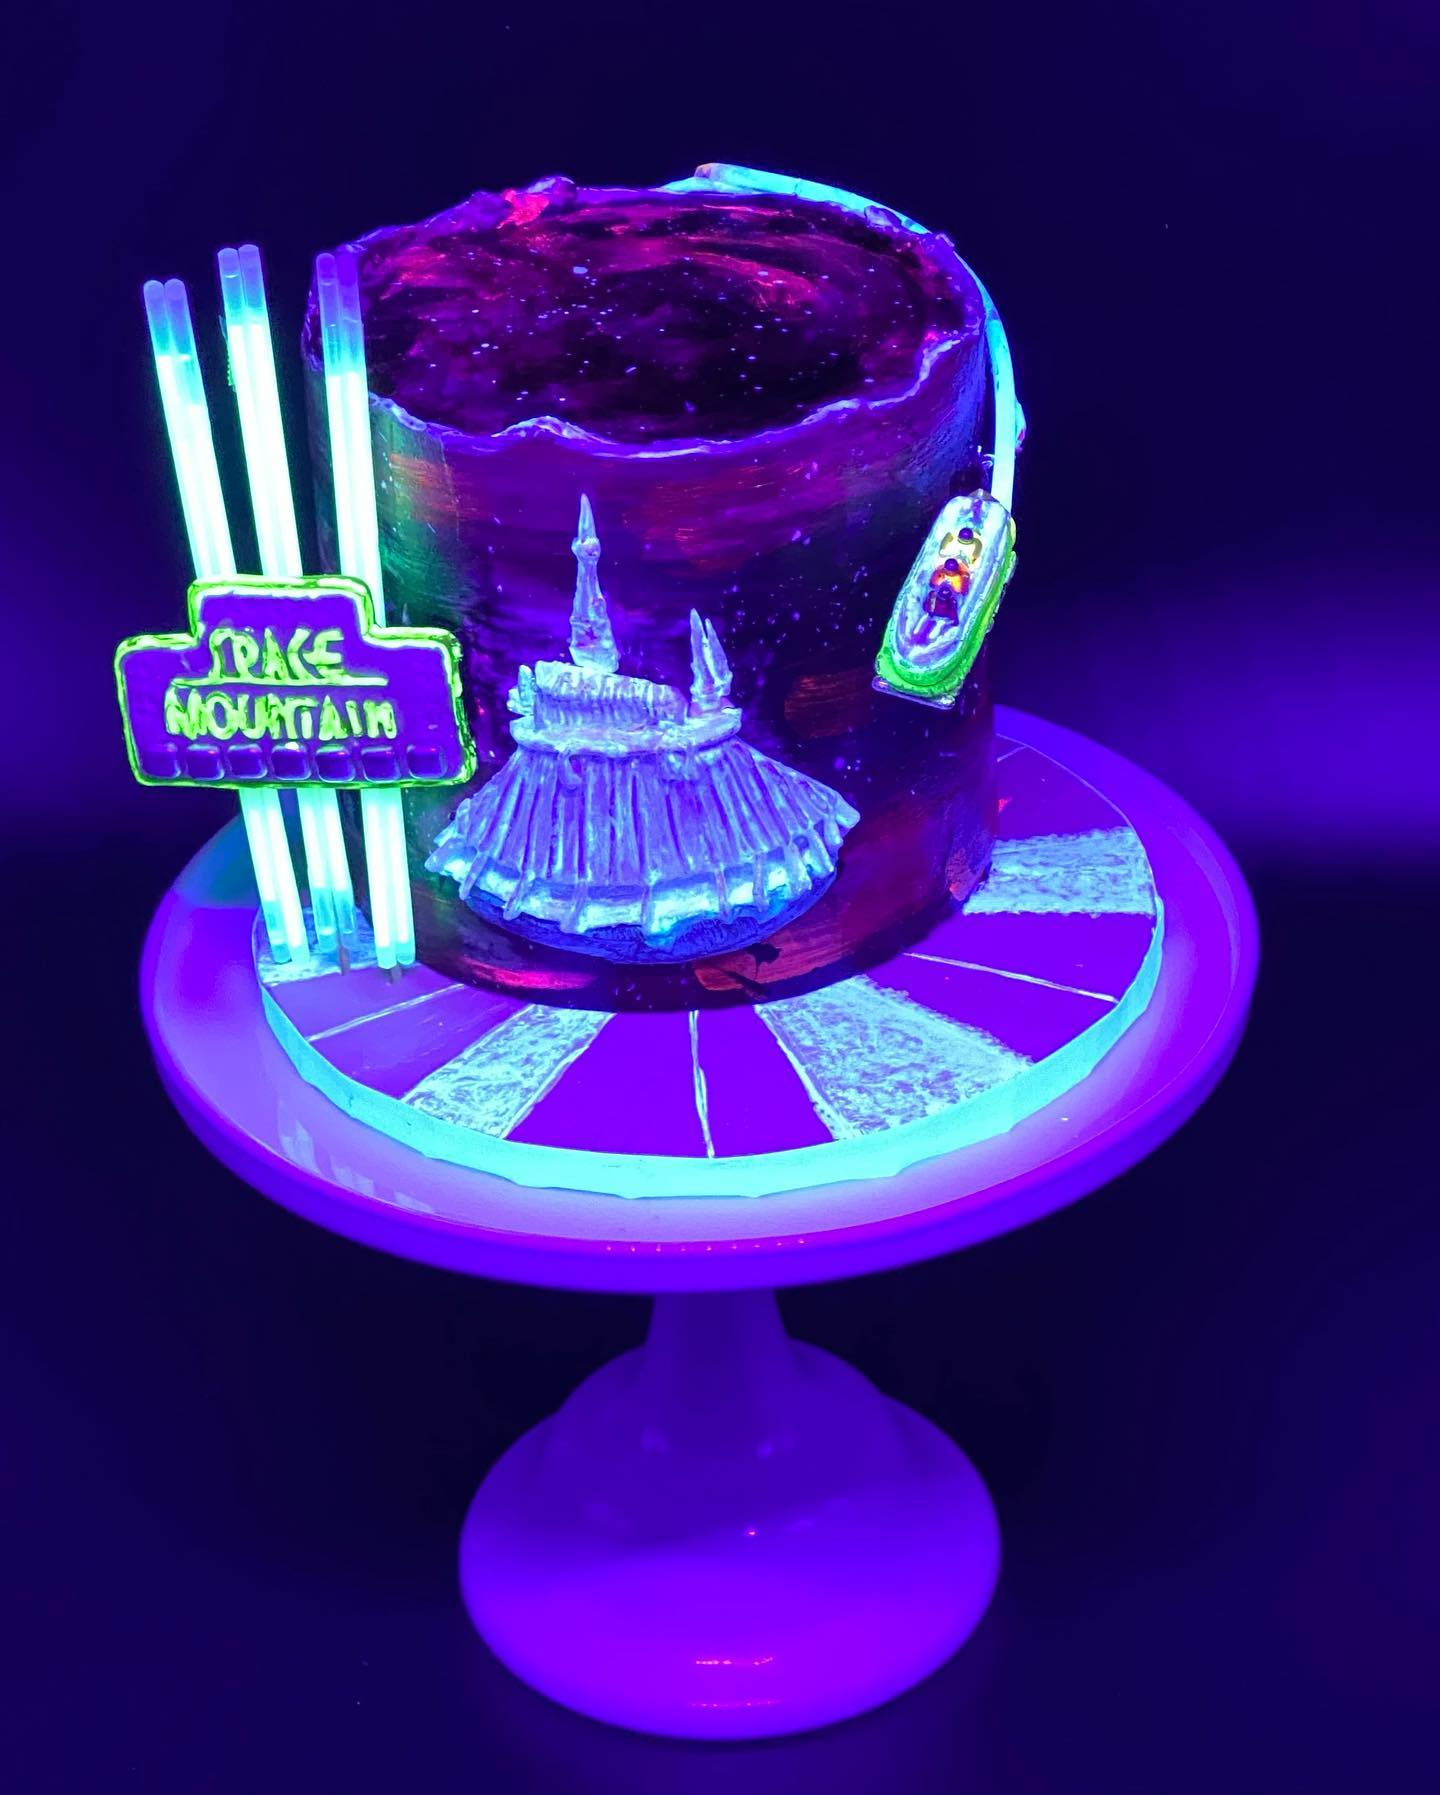 Glow in the dark Space mountain Cake